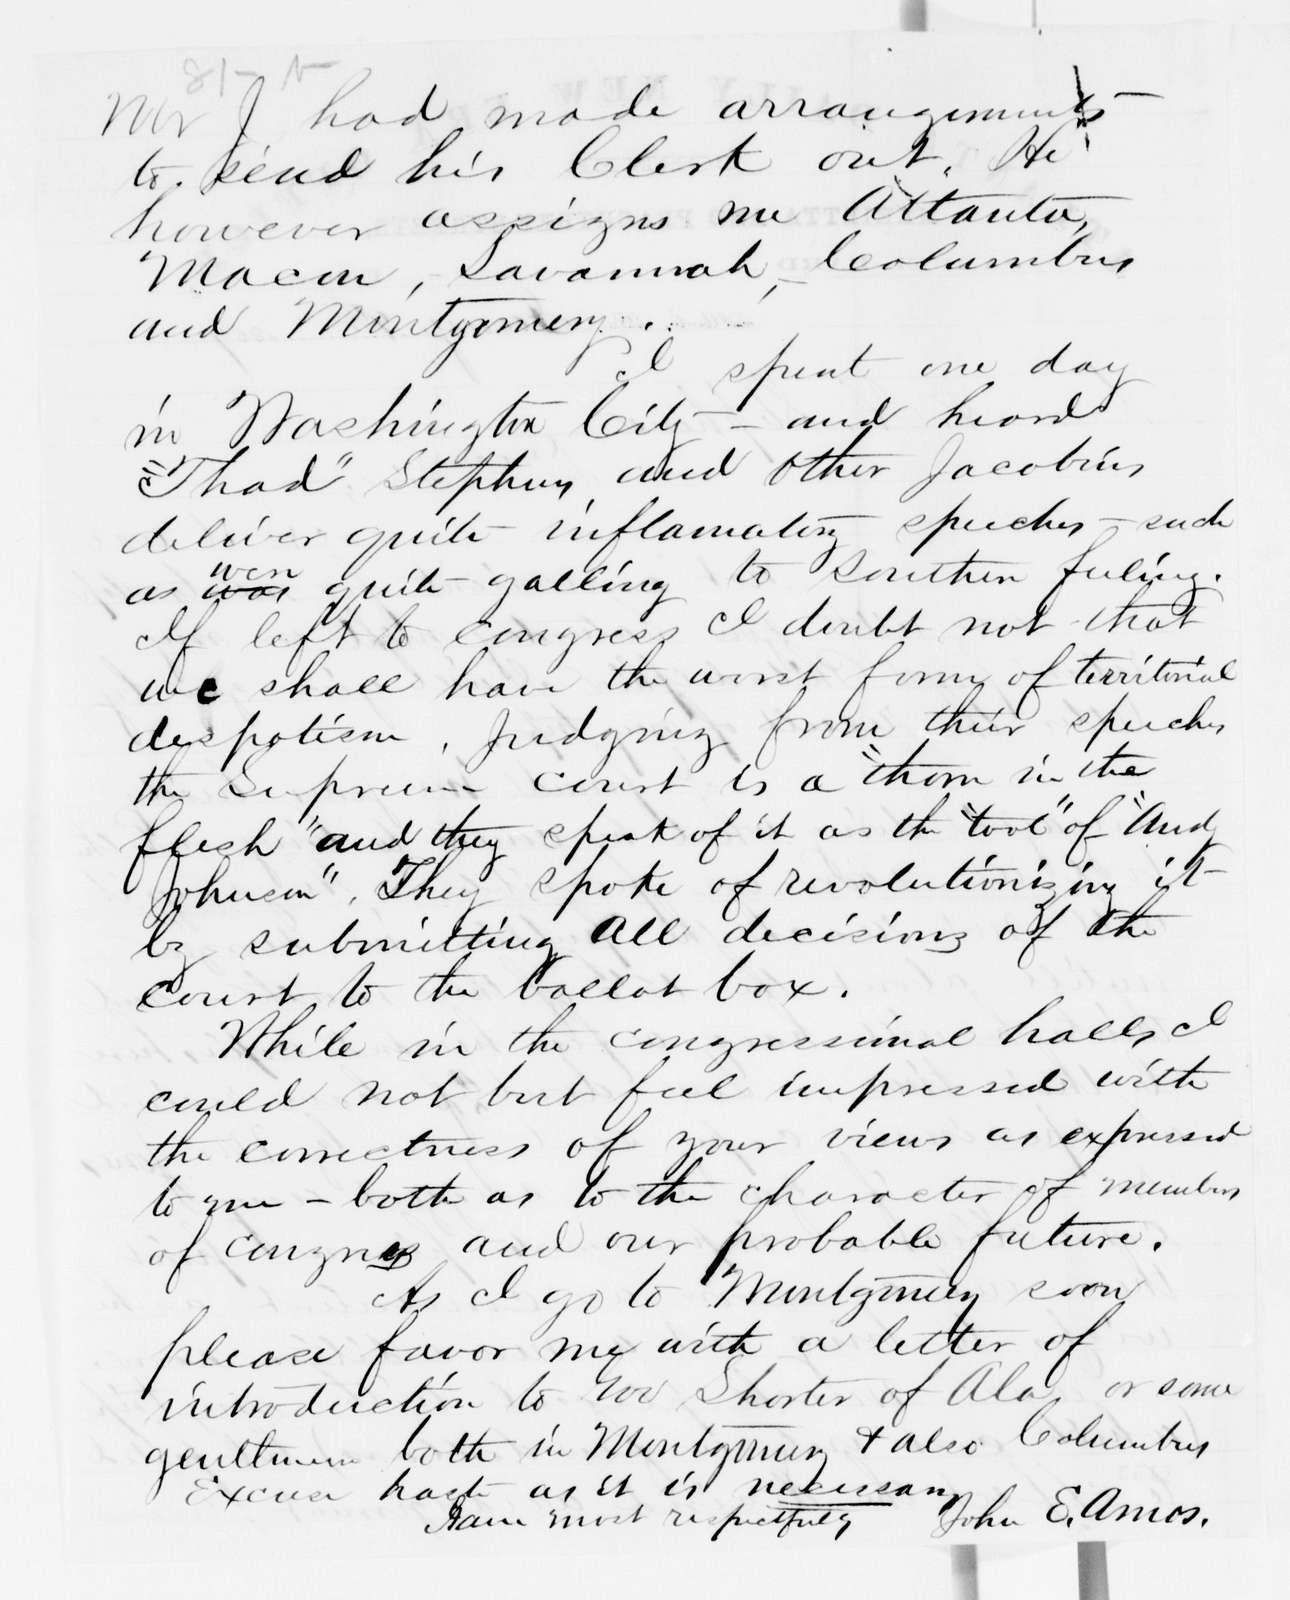 Alexander Hamilton Stephens Papers: General Correspondence, 1784-1886; 1867, Jan. 9-May 10